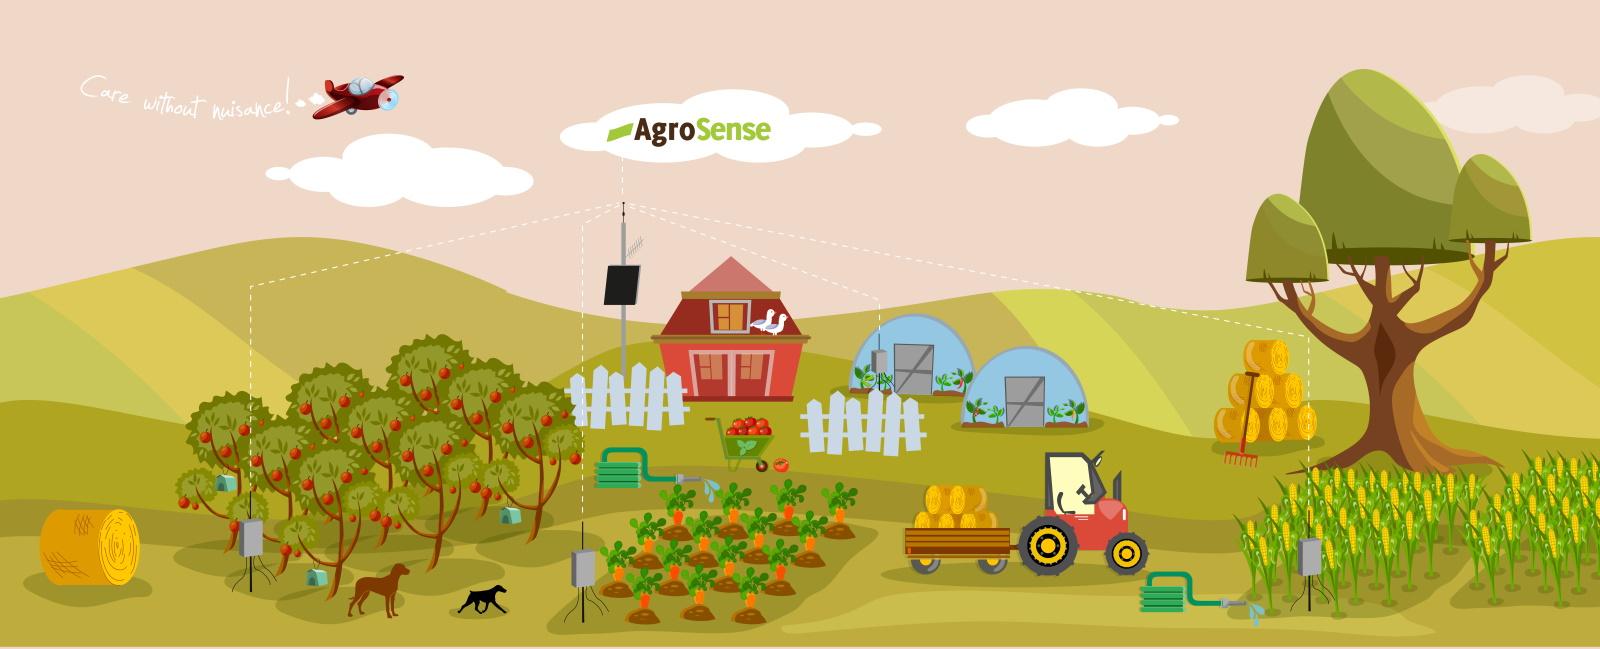 AgroSense Farm ES